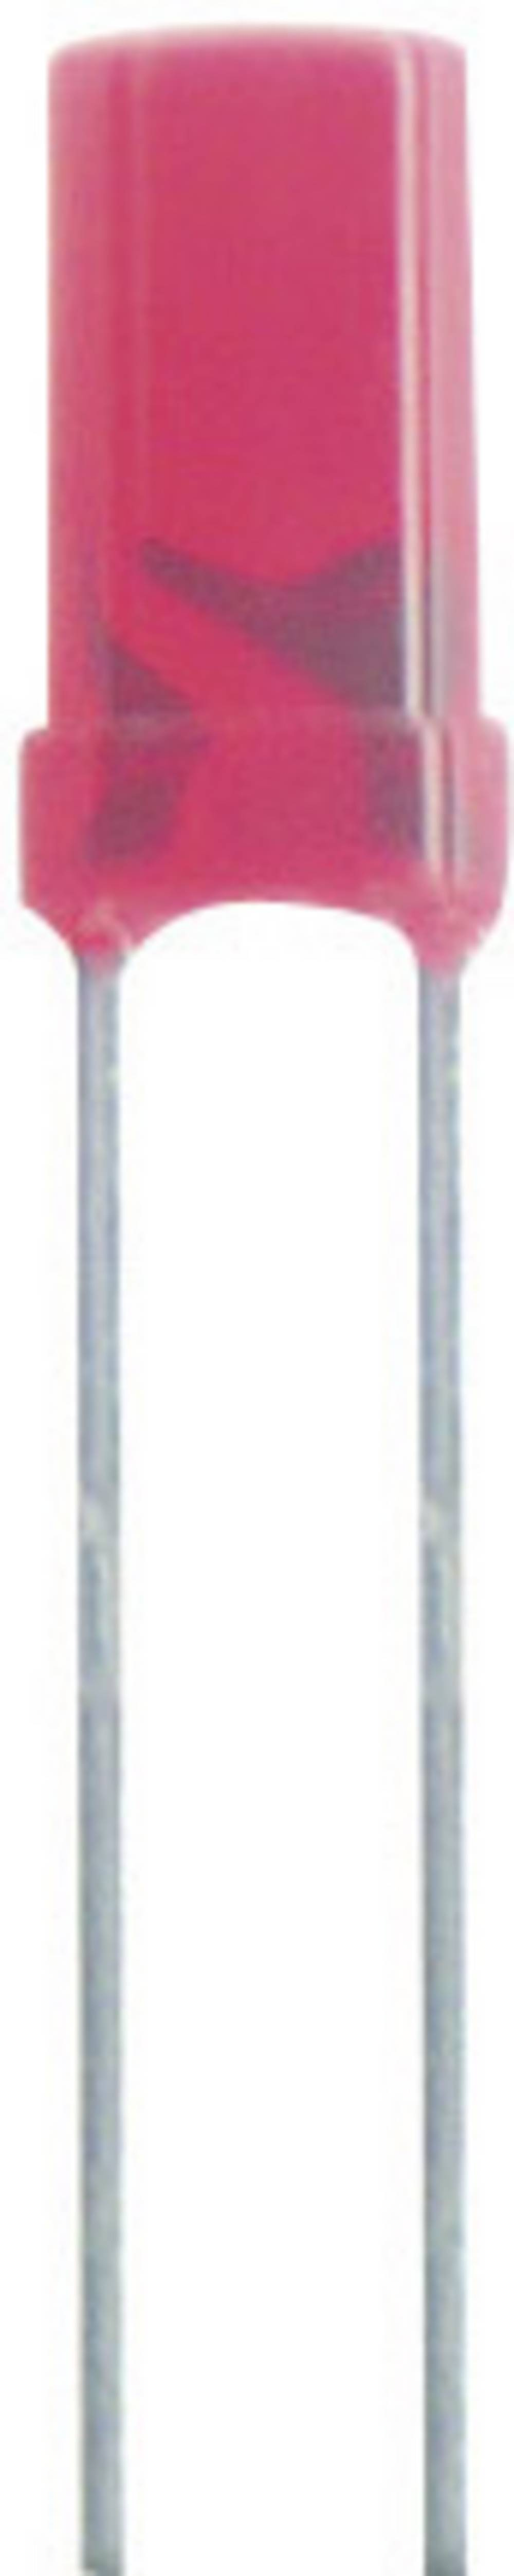 Ožičana LED dioda, zelena, cilindrična 3 mm 4 mcd 70 ° 20 mA 2.2 V Kingbright L-424GDT